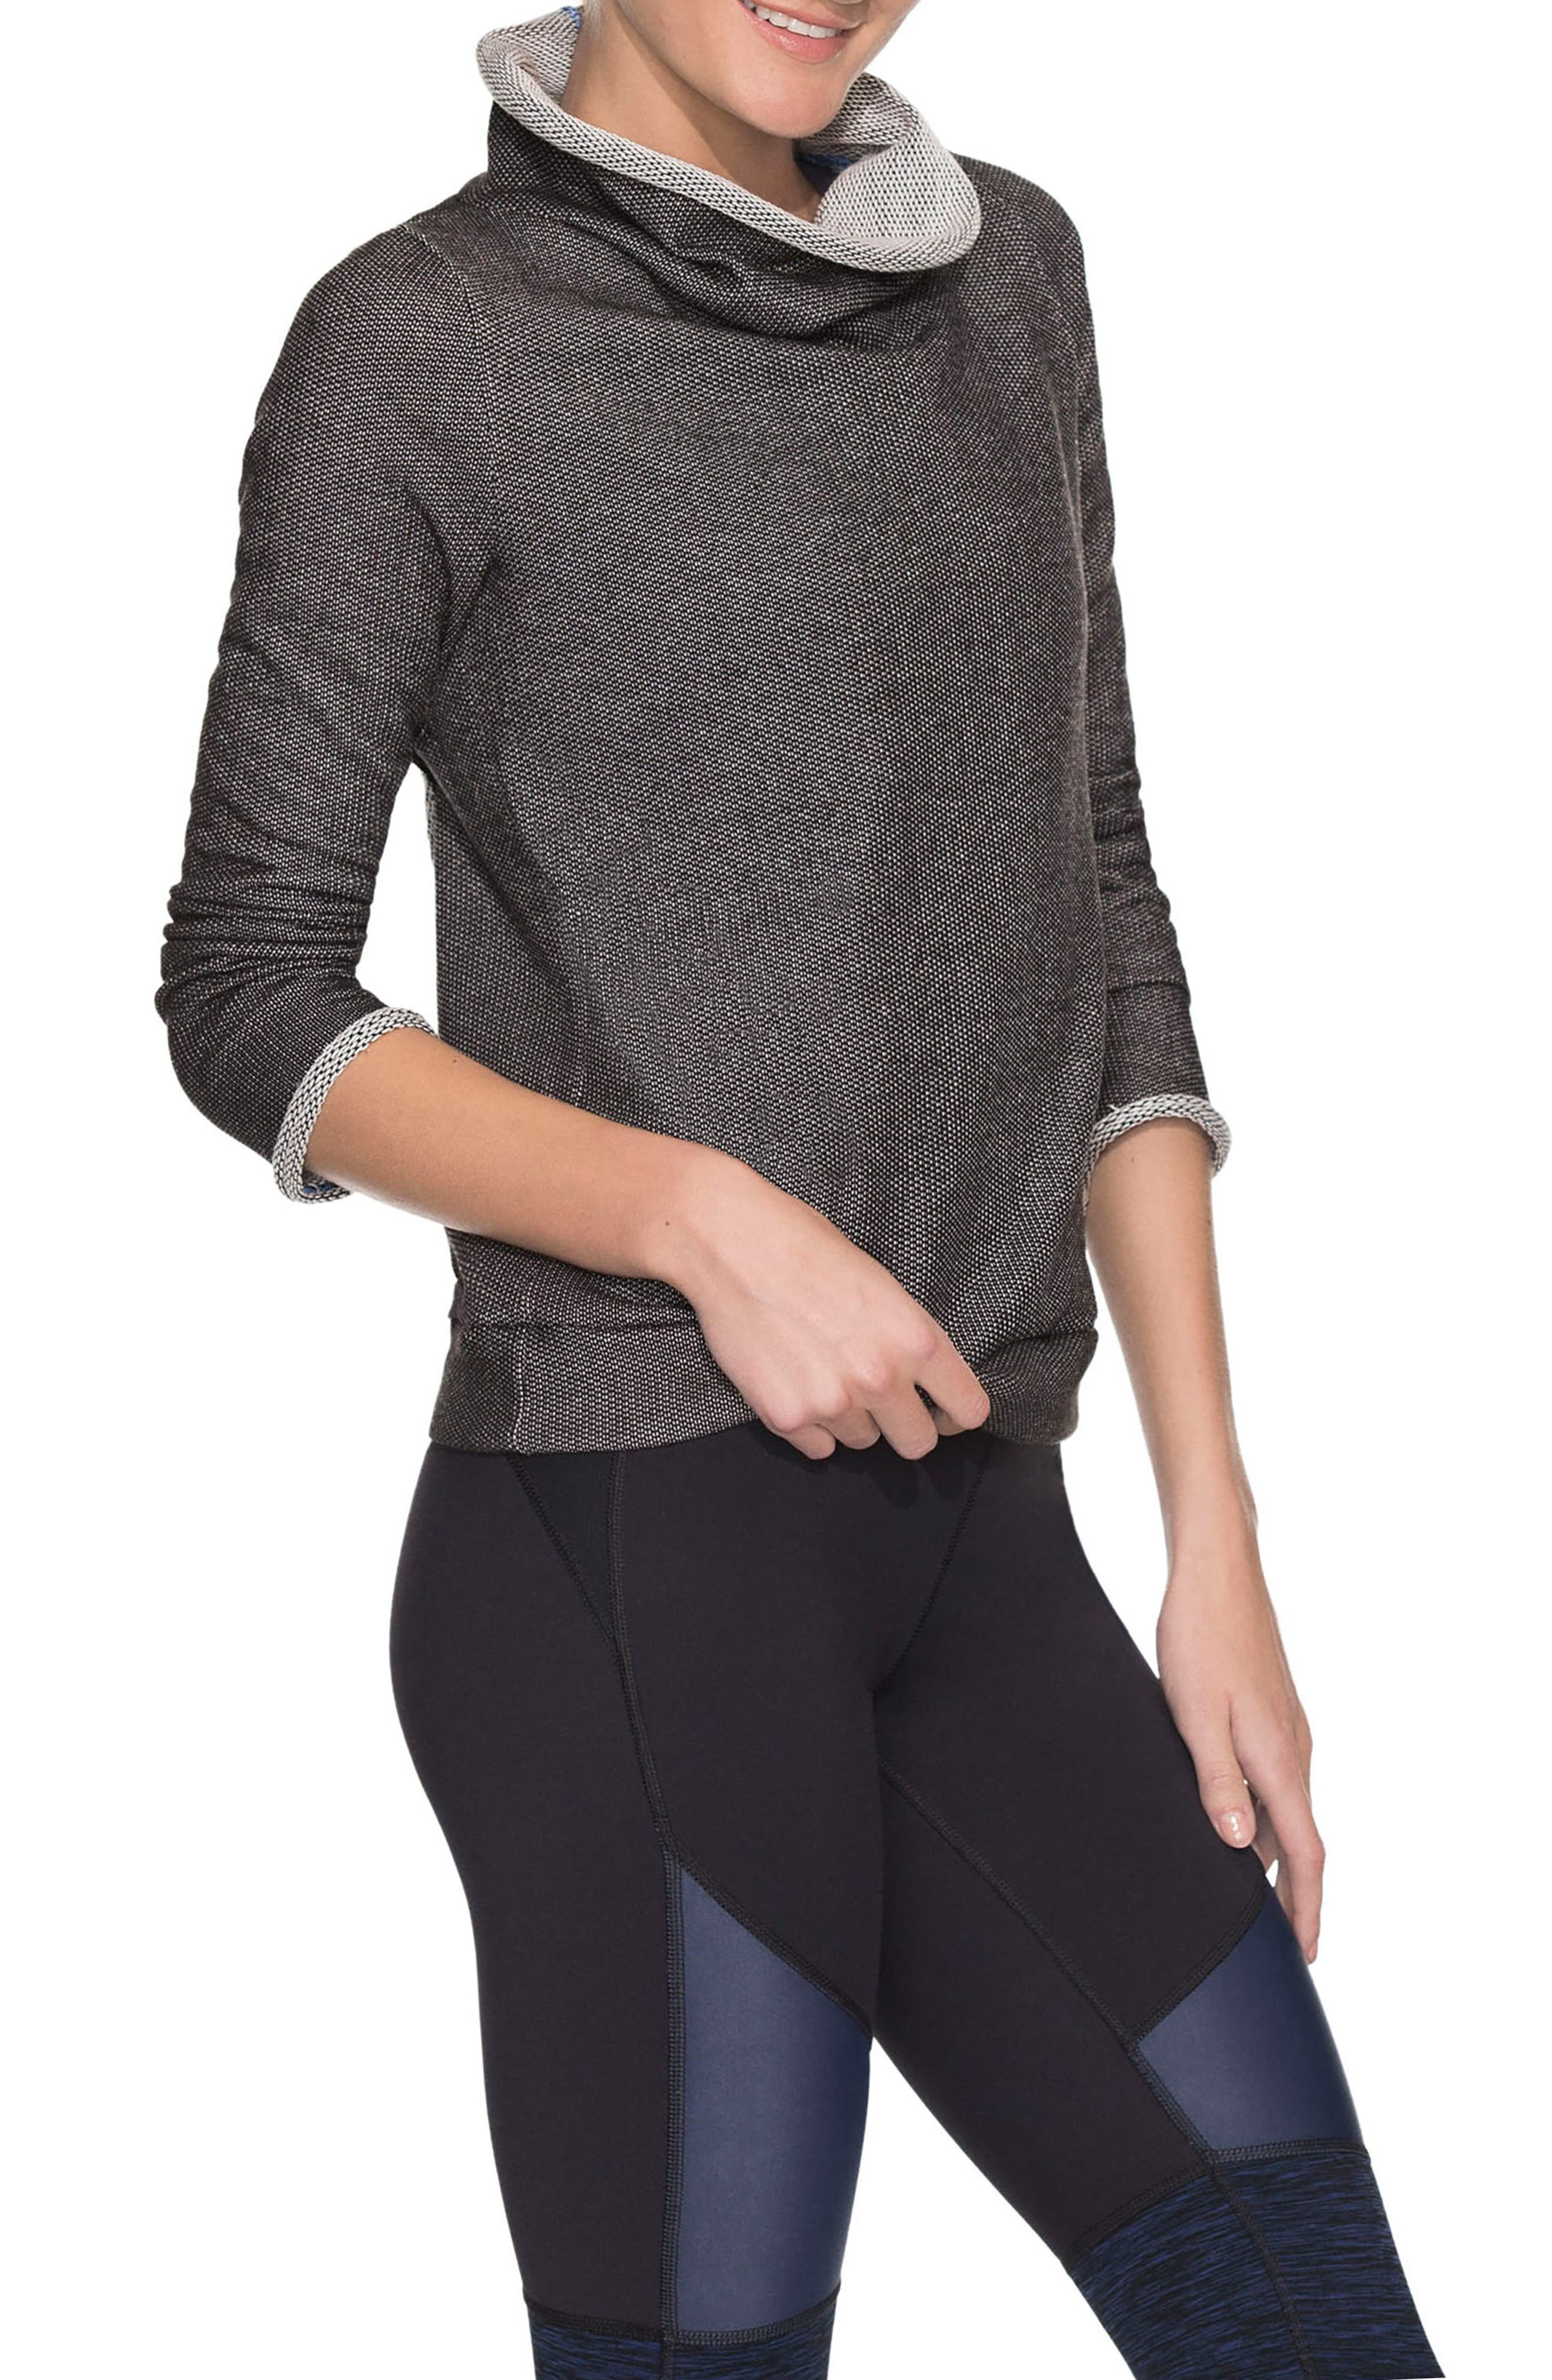 Cloudburst Sweatshirt,                         Main,                         color, Black